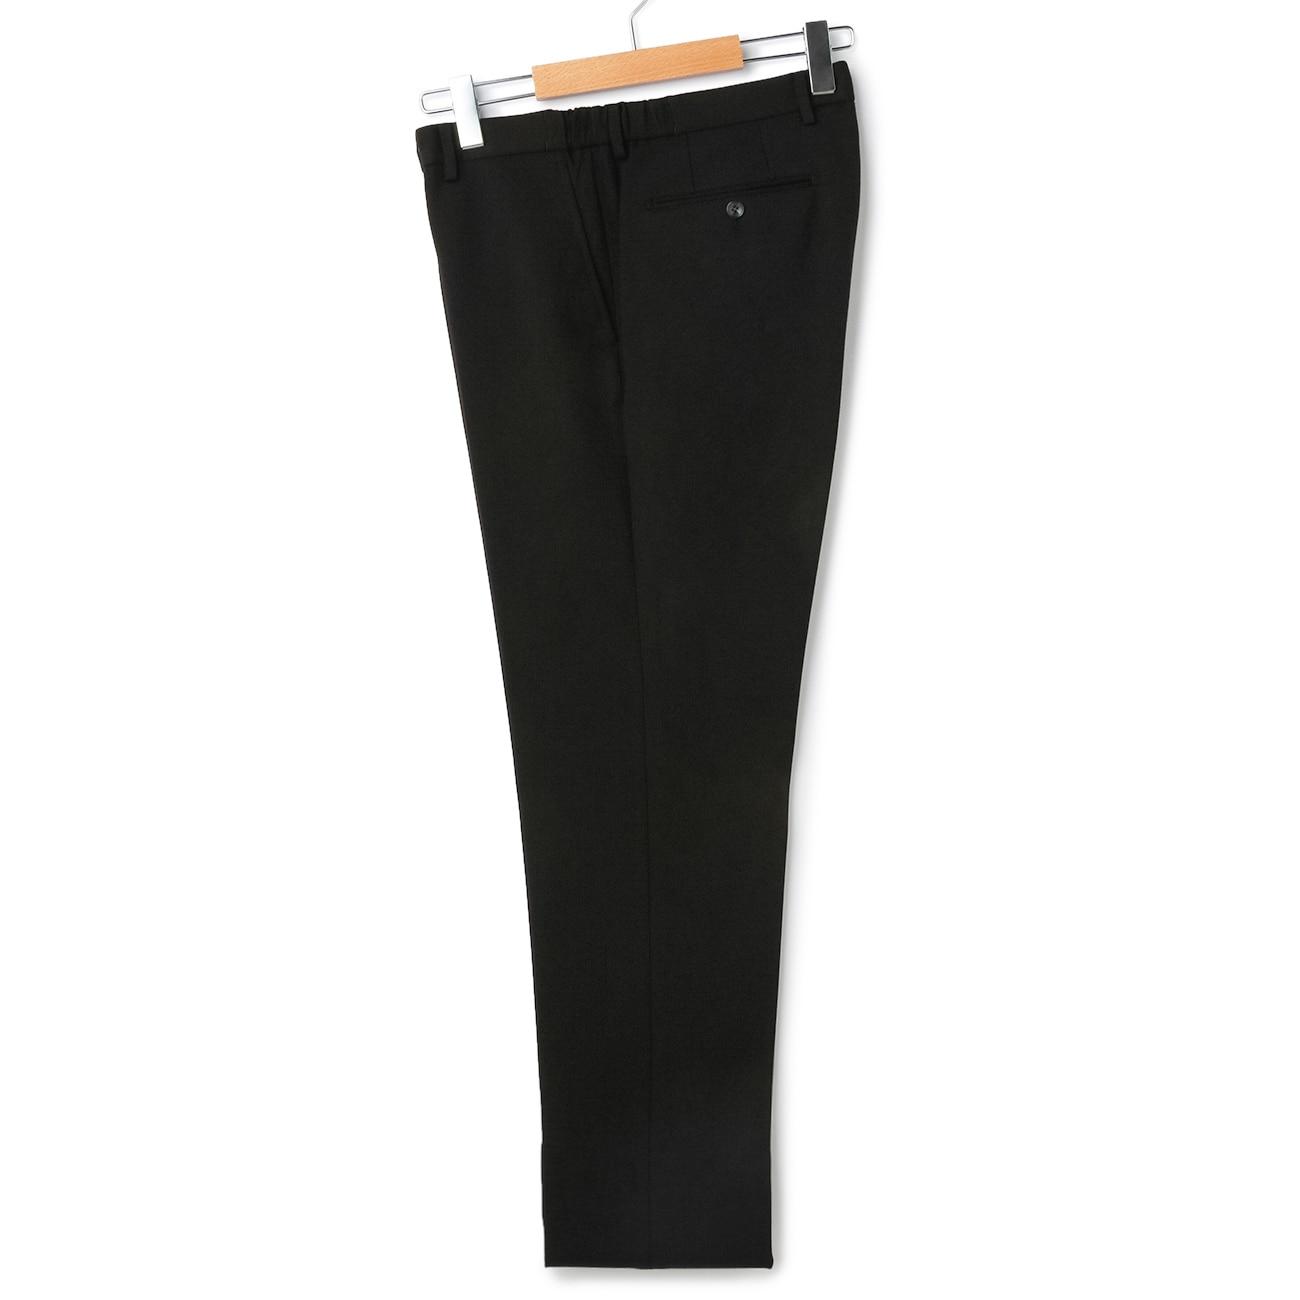 【nano・universe DESIGN】ストレッチジャージーパンツ 黒織柄 【セットアップ着用可】